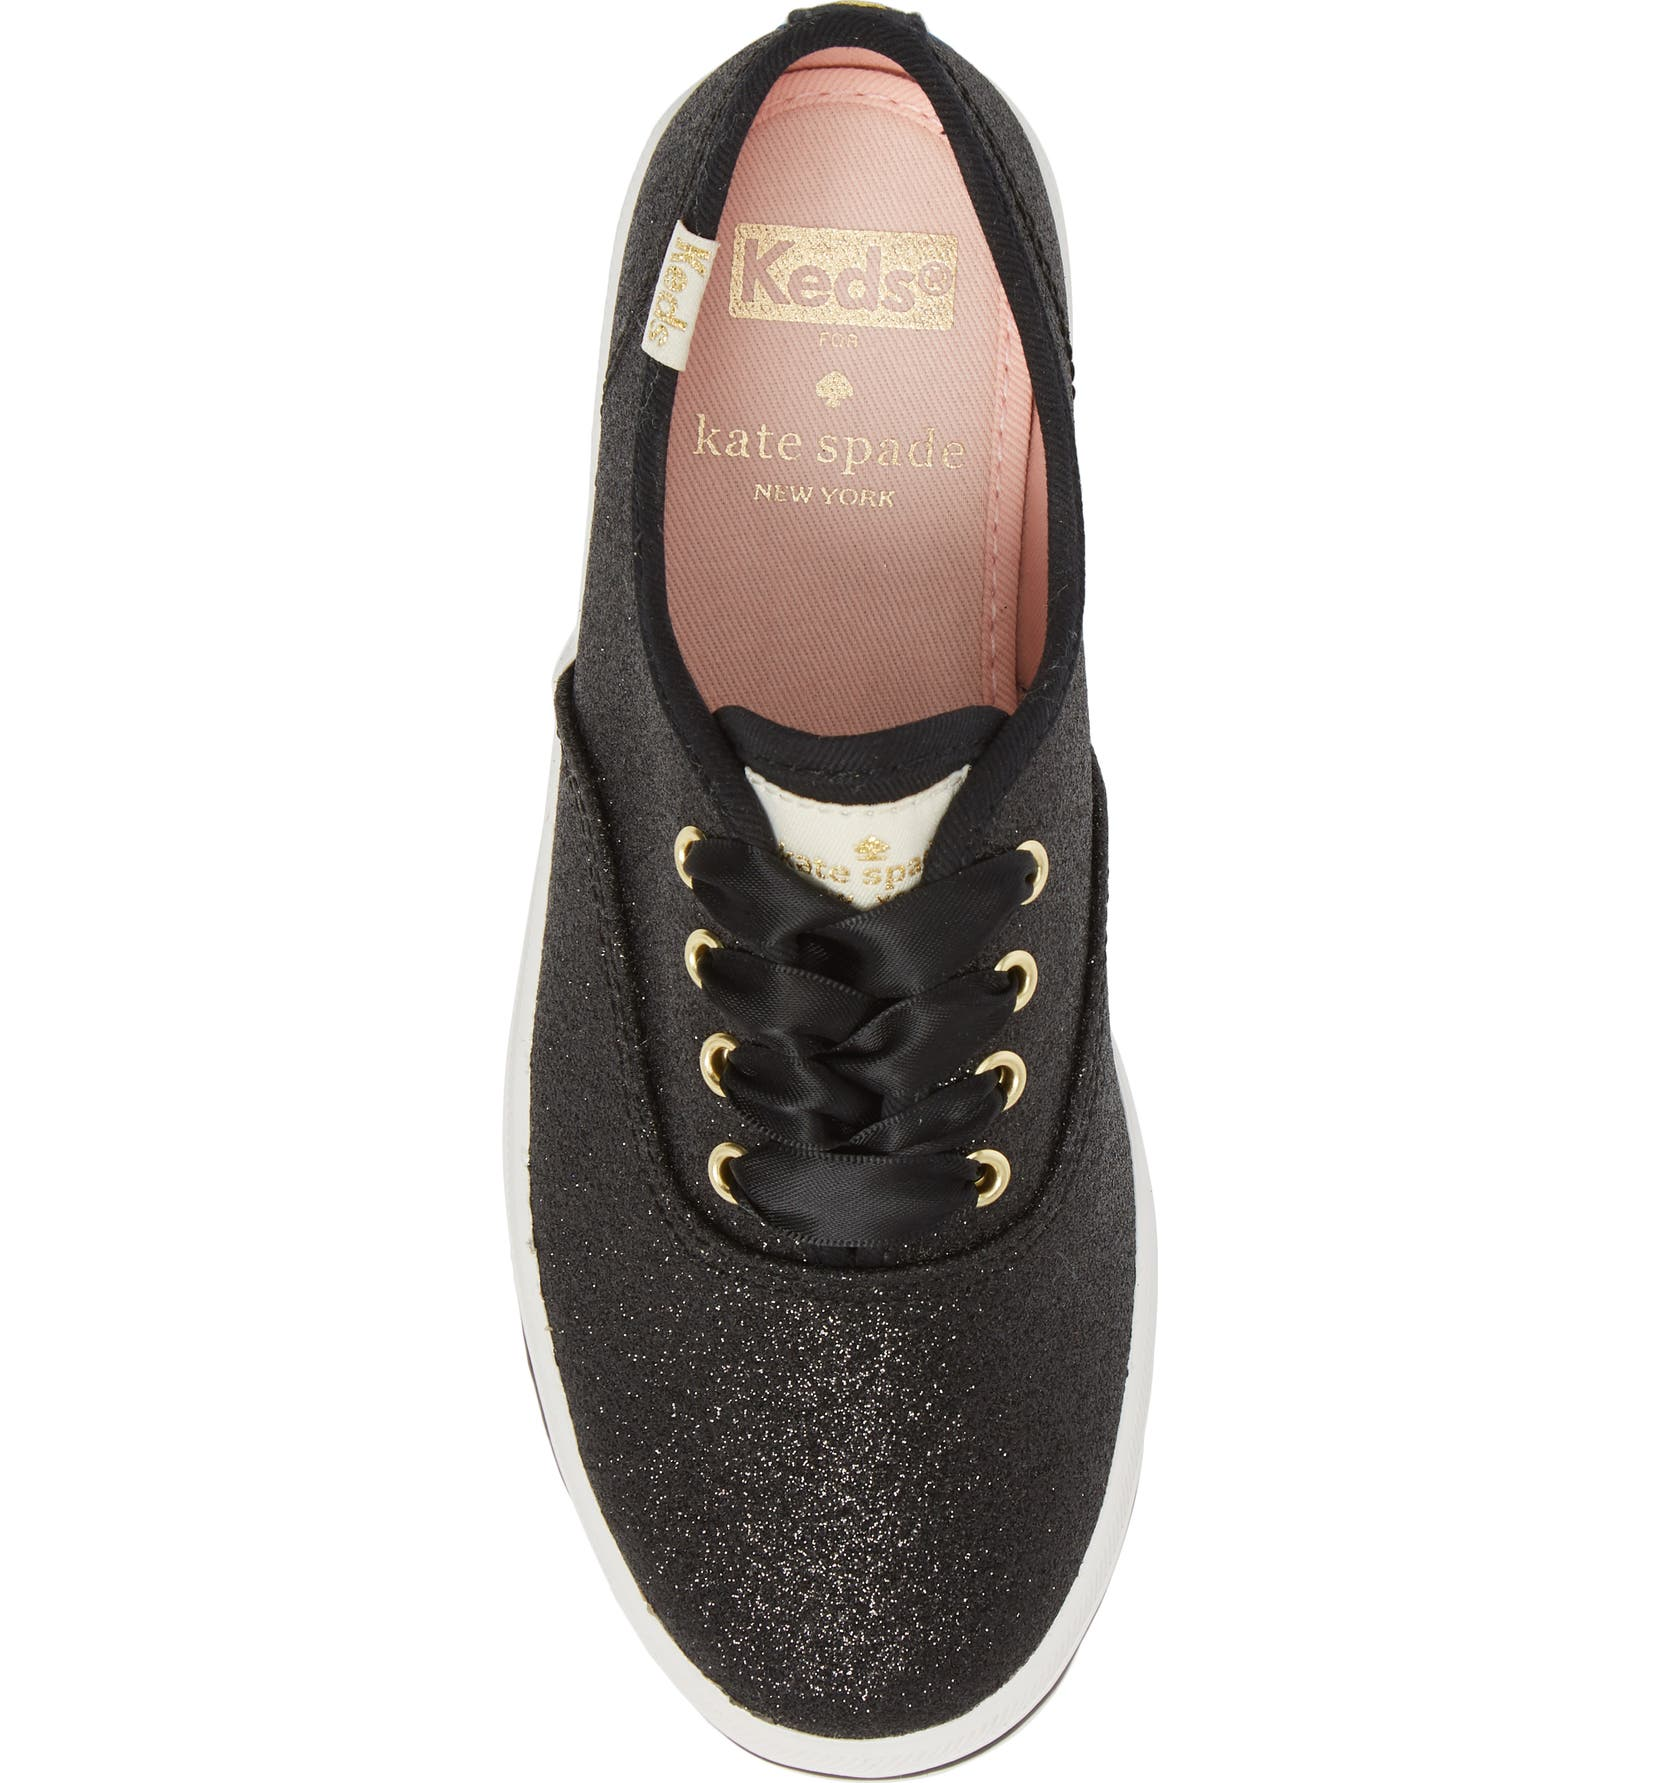 9fa25e4f4b98 Keds® x kate spade new york Champion Glitter Sneaker (Walker ...